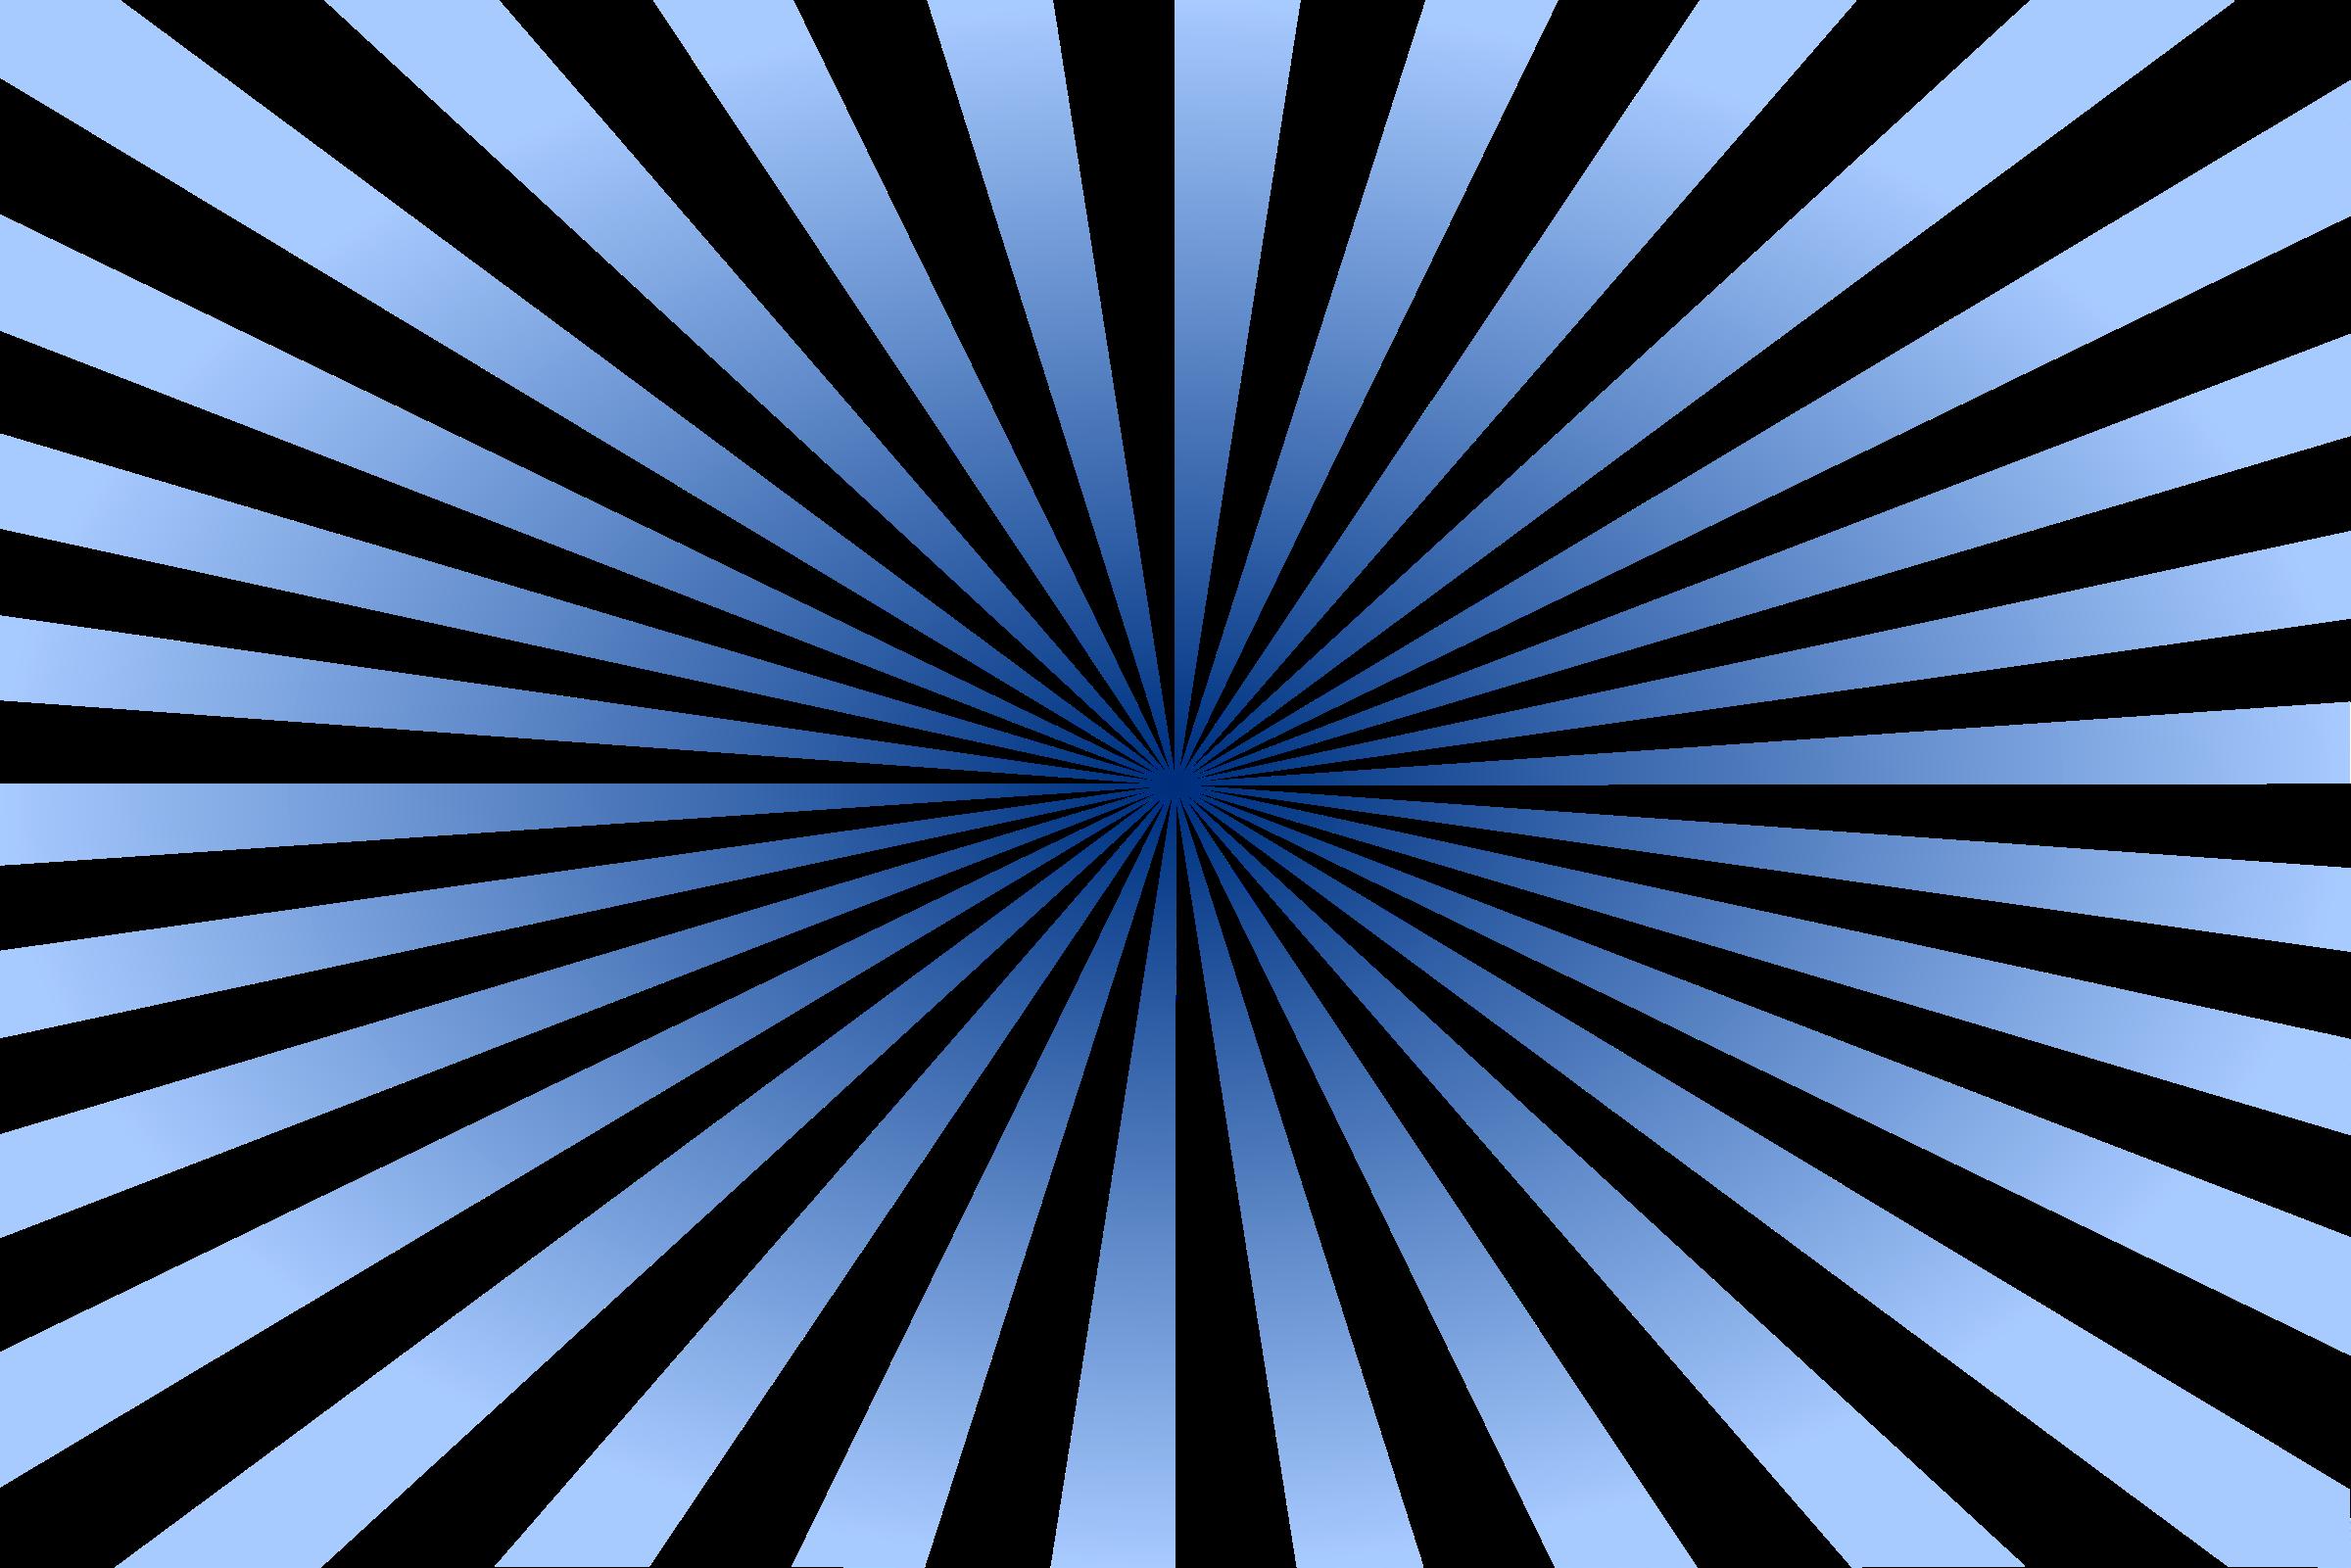 Blue Sunburst Vector Clipart image.